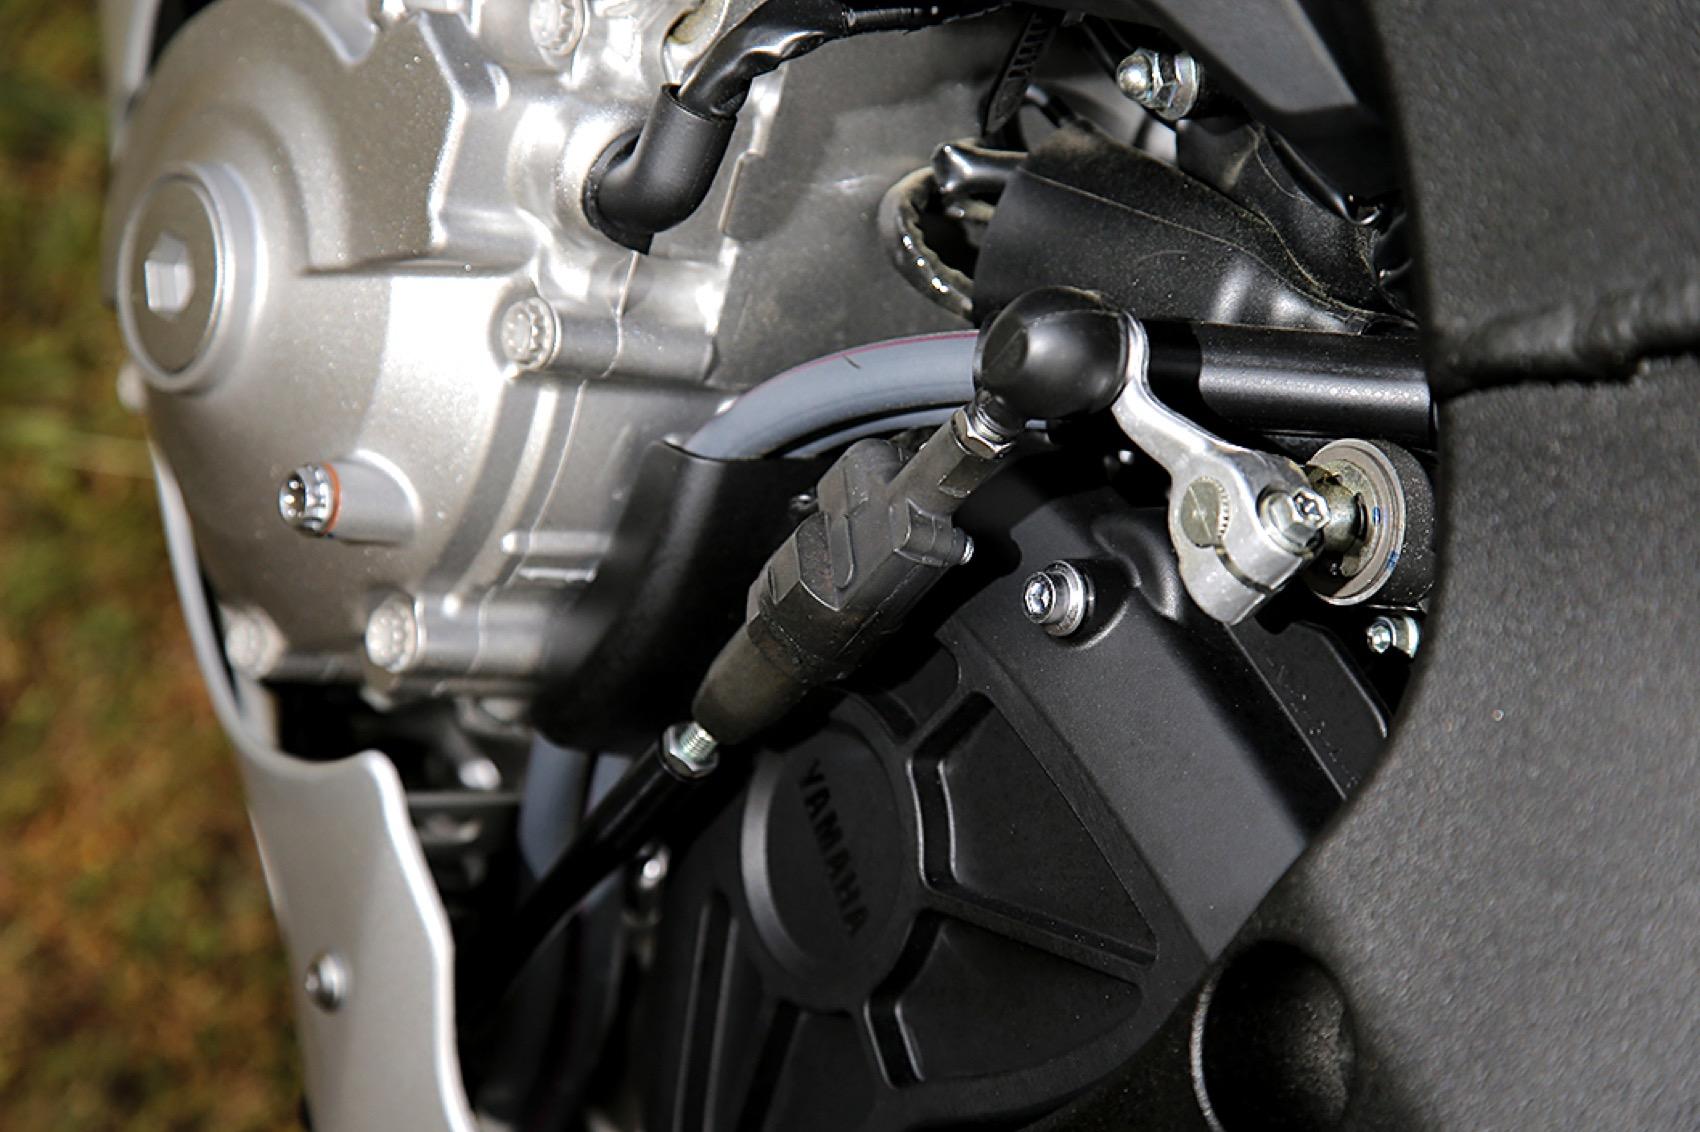 Comaprativa Yamaha MT 10 vs Yamaha YZF-R1